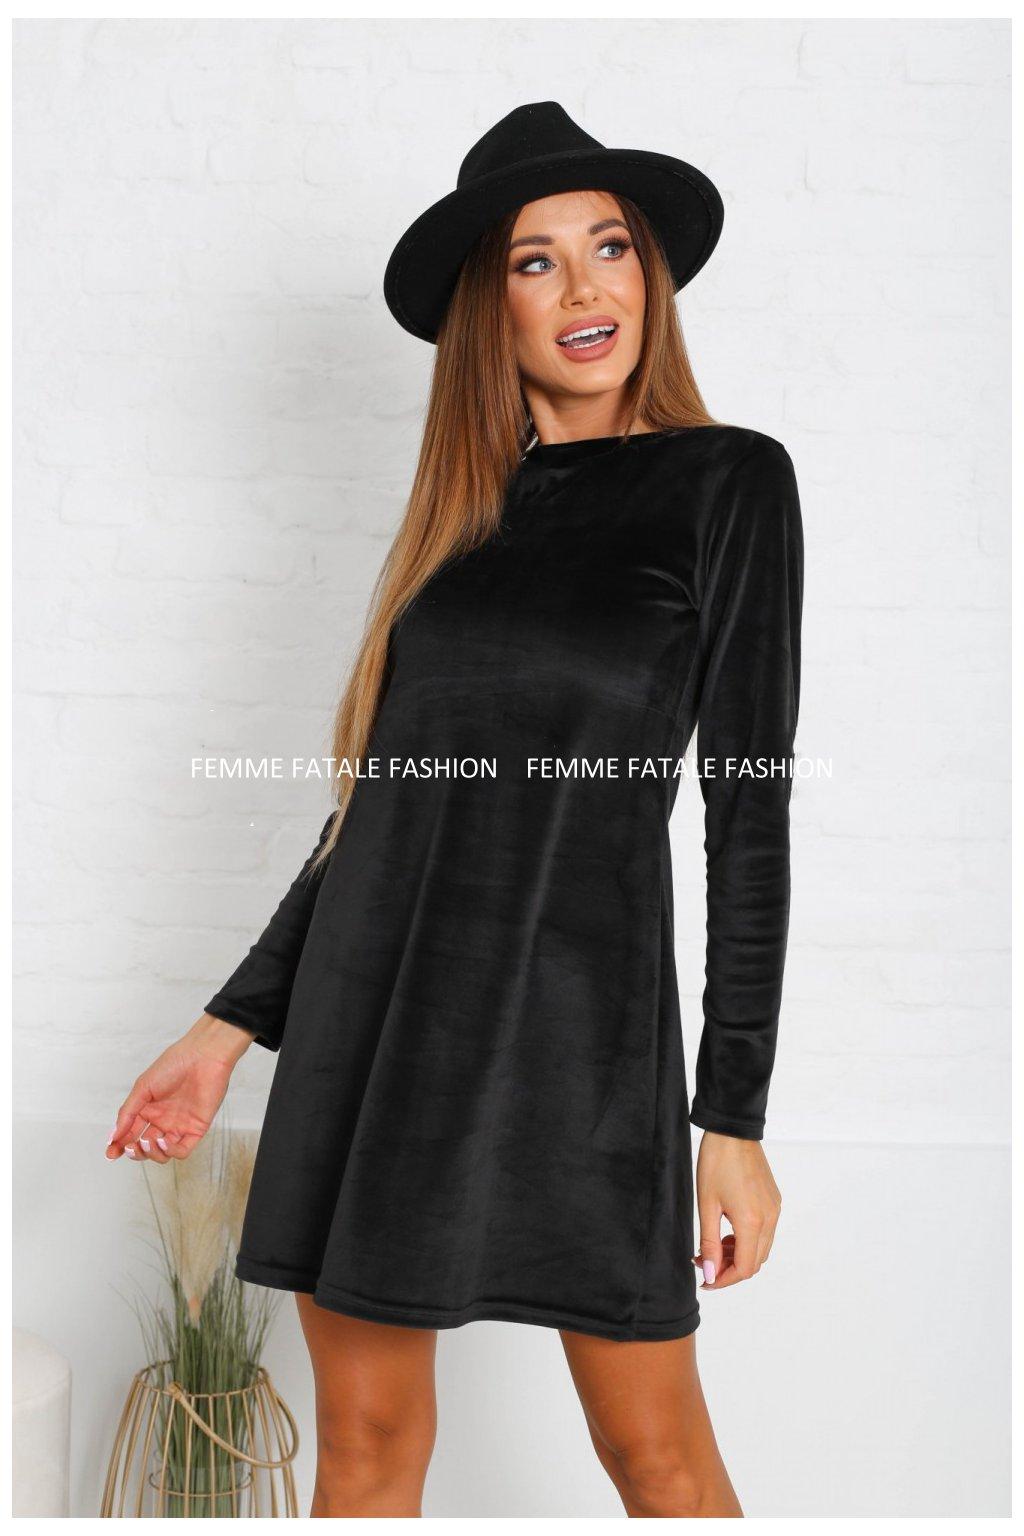 Dámské sametové šaty PEGI femmefatalefashion (2)